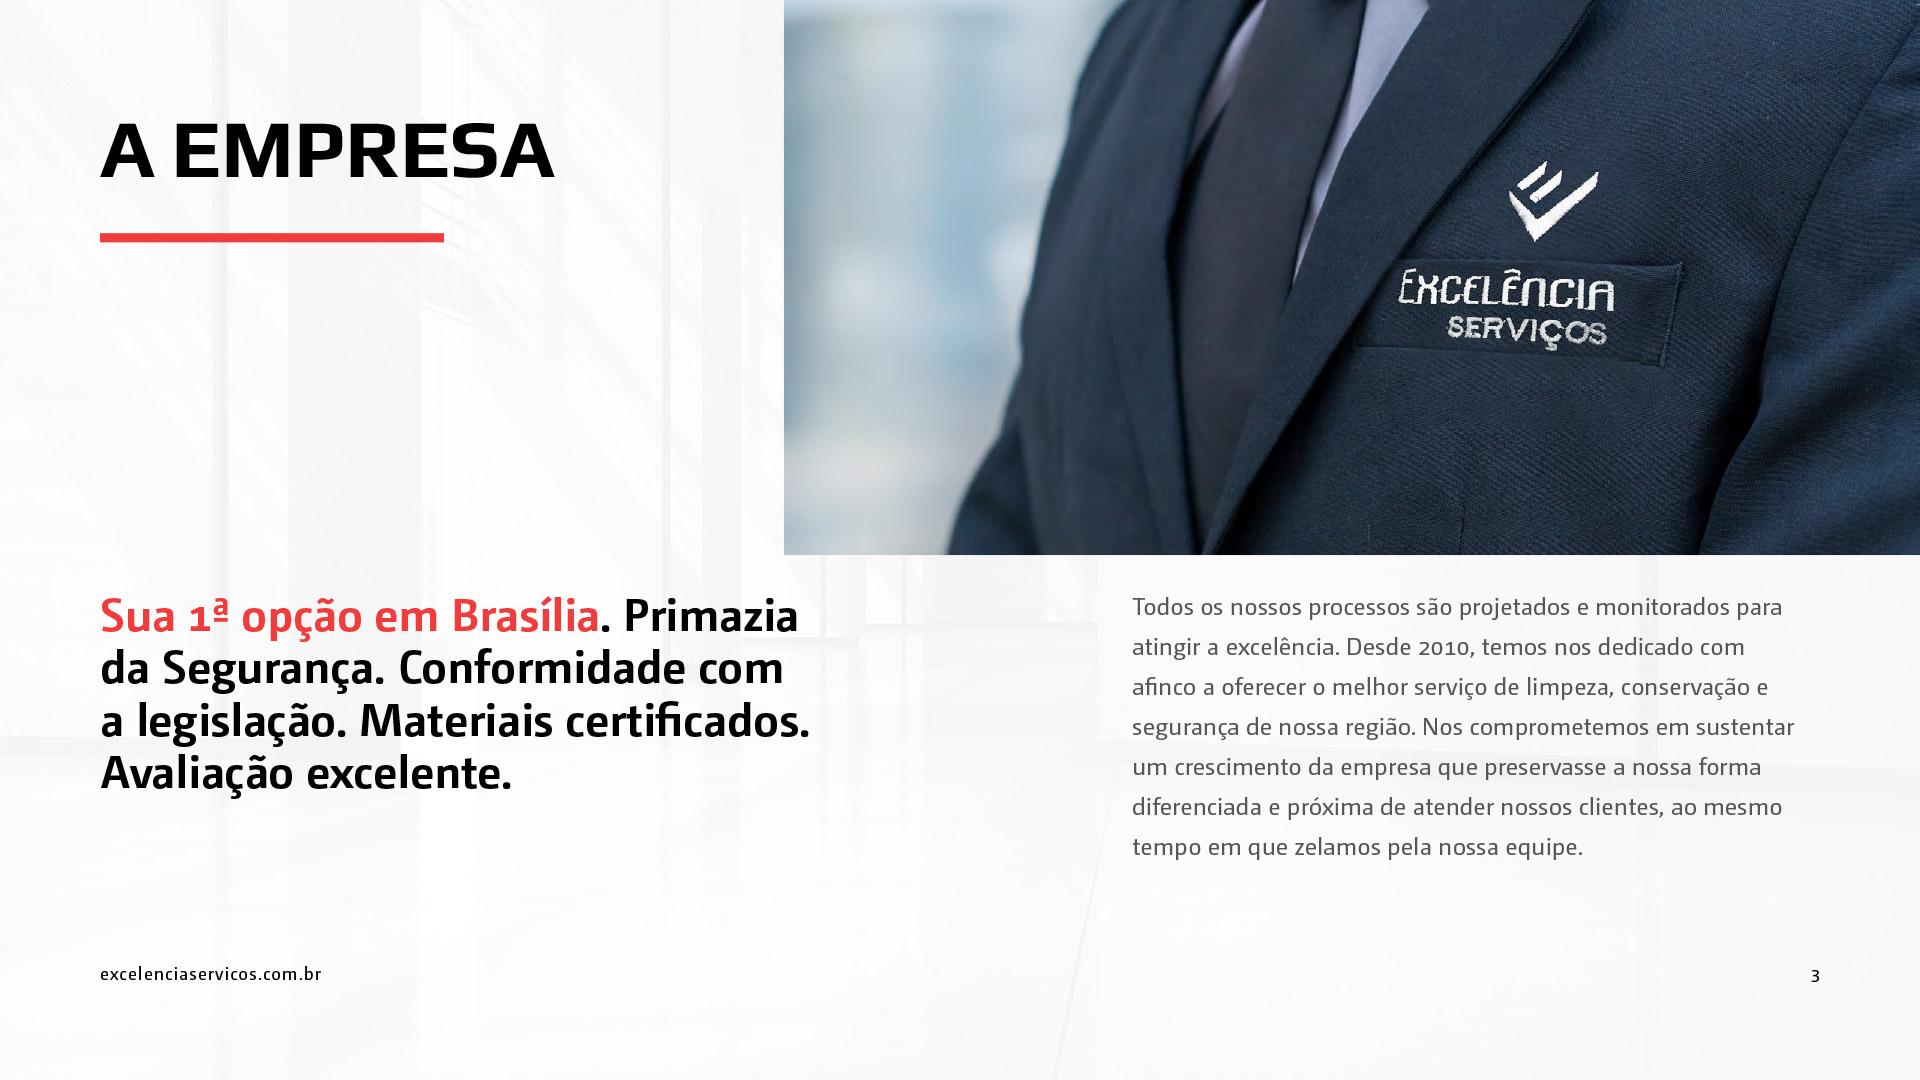 apresentacao-excelencia-03